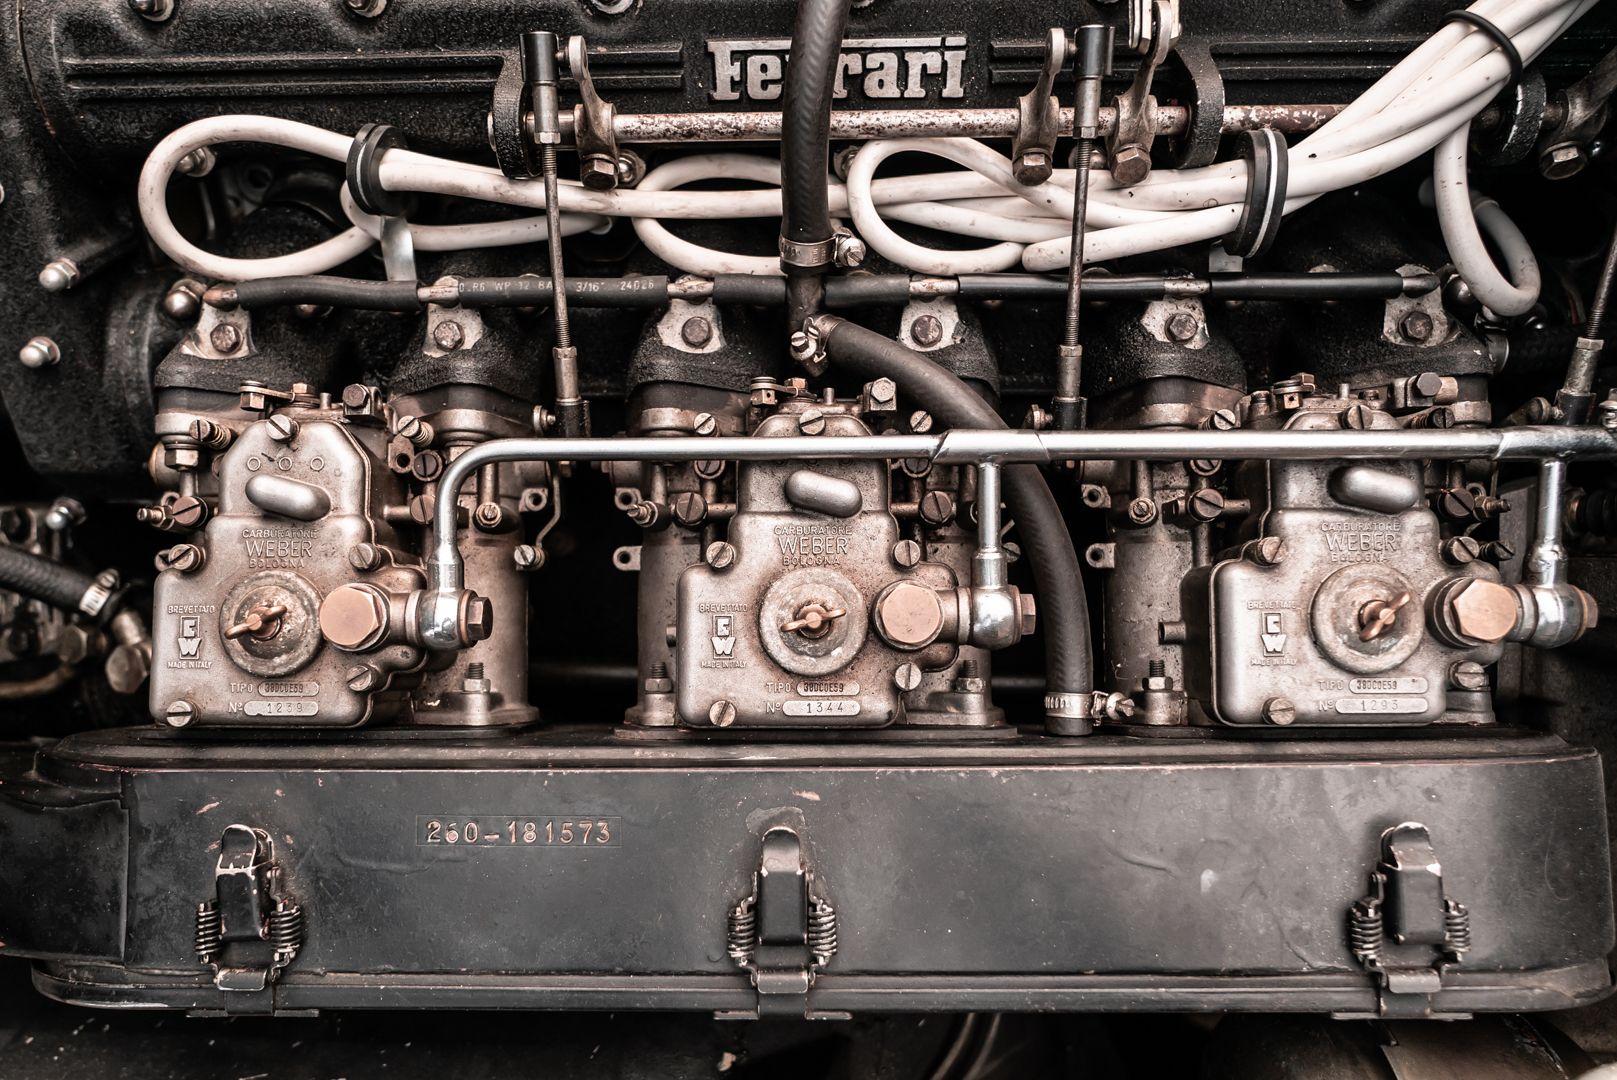 1973 Ferrari 365 GT4 2+2 66455